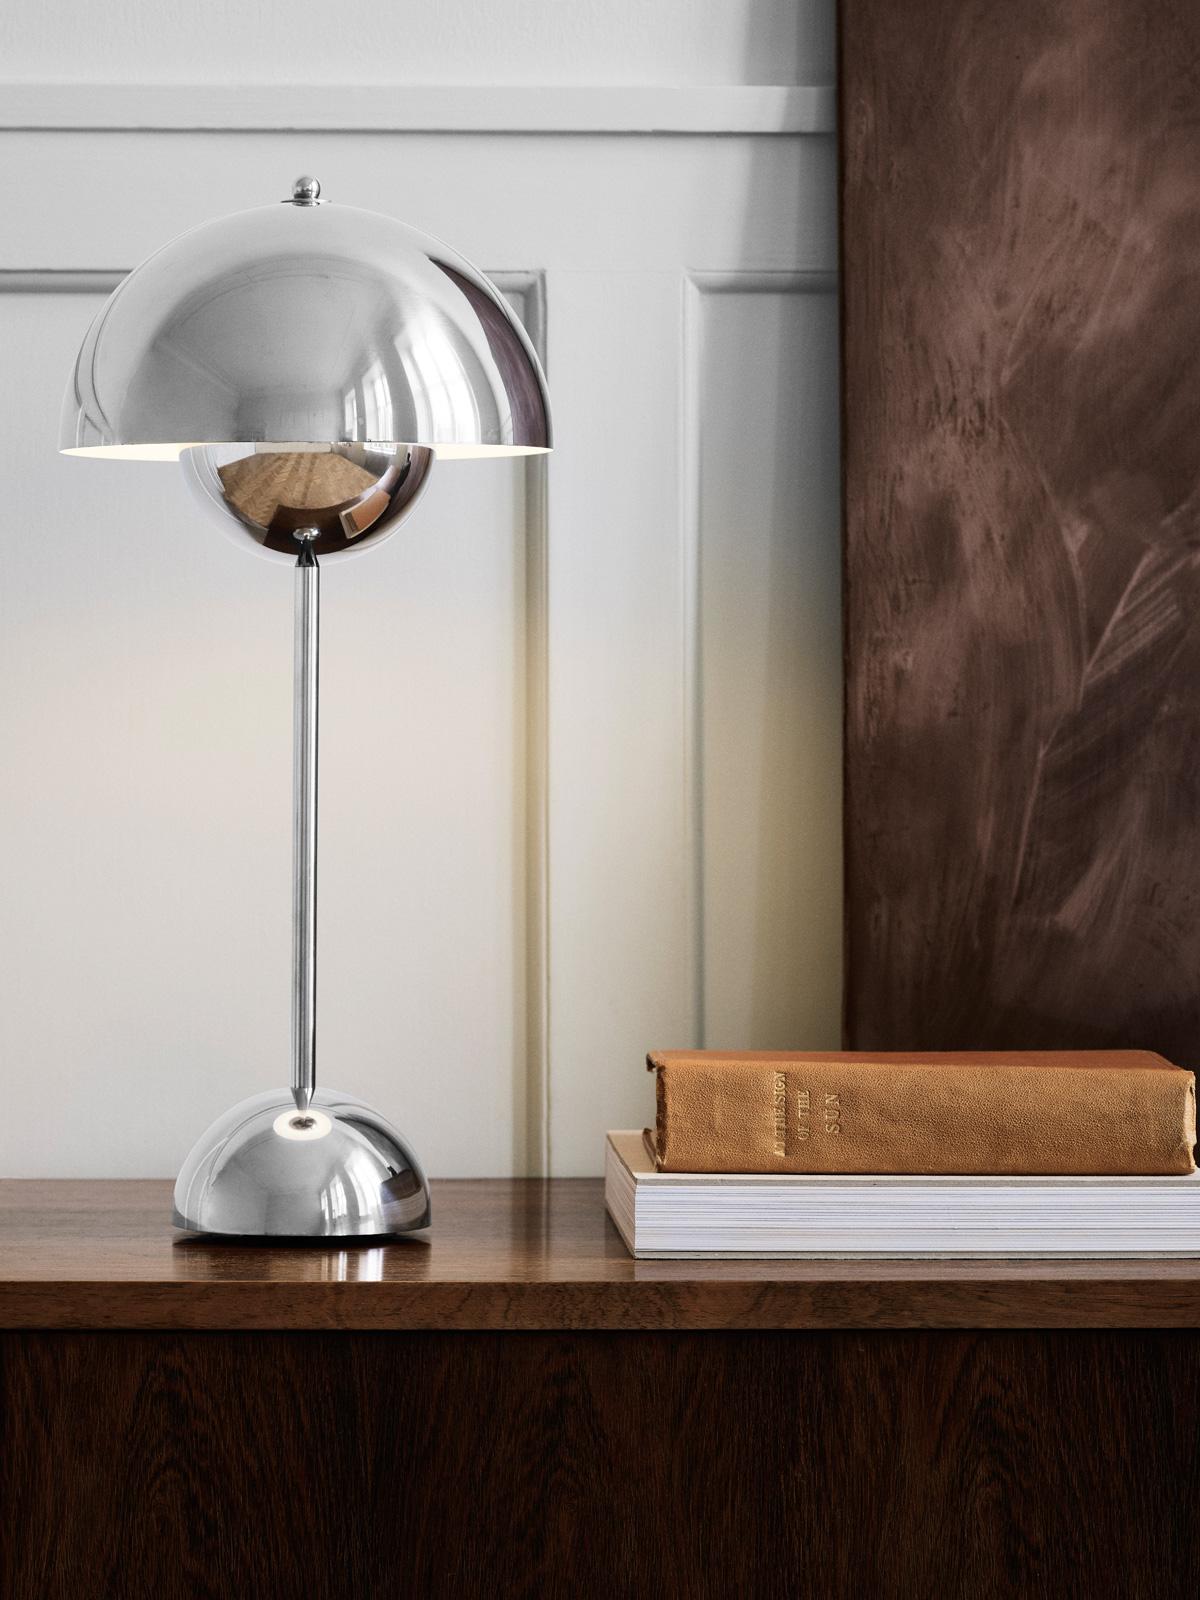 &tradition Flowerpot Vp3 Verner Panton Leuchte Designort Lampen Onlineshop Berlin